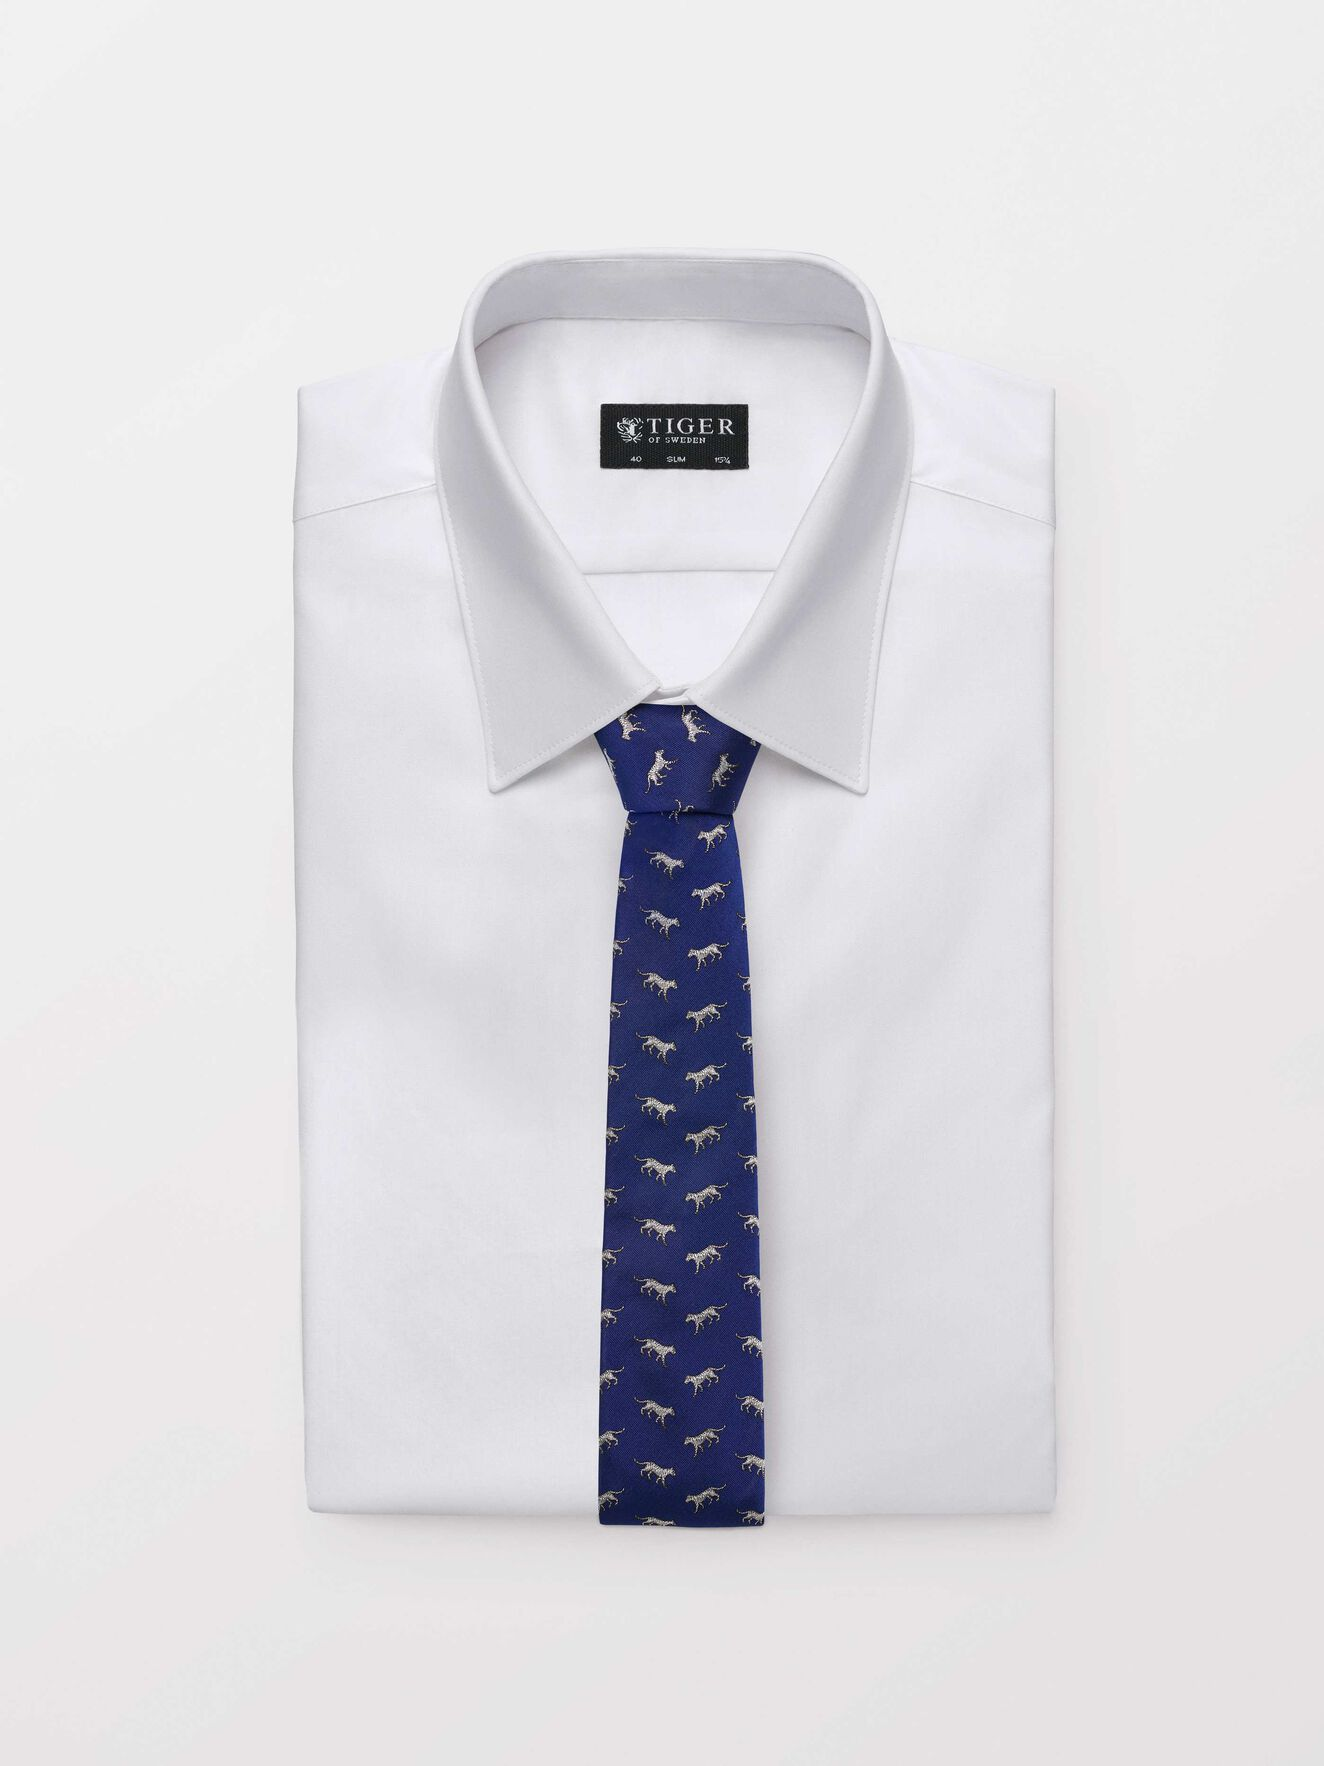 Trigon Tie in Deep Ocean Blue from Tiger of Sweden